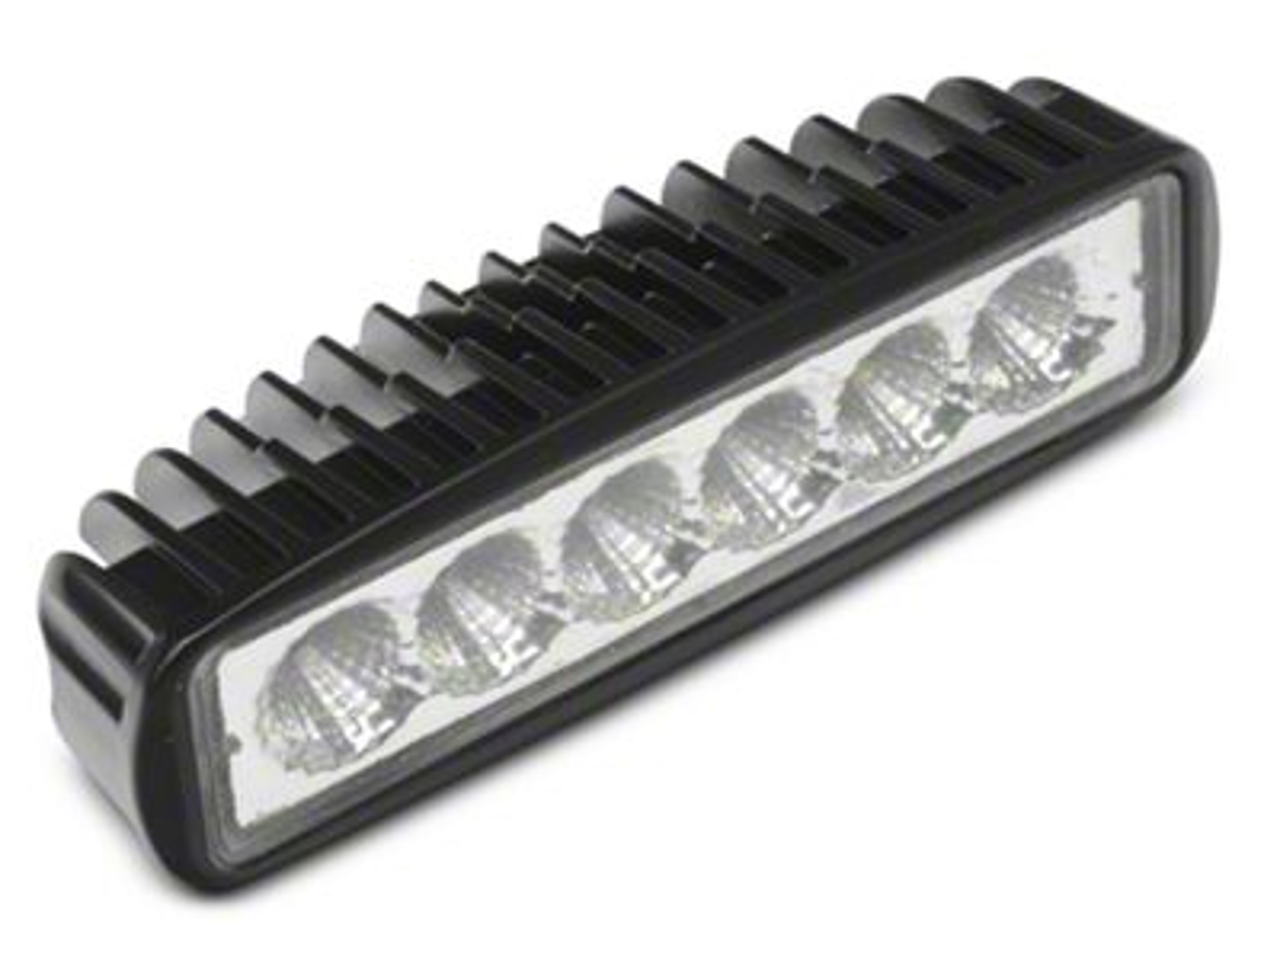 Raxiom 6 in. Slim 6-LED Off-Road Light - Flood Beam (07-18 Jeep Wrangler JK; 2018 Jeep Wrangler JL)